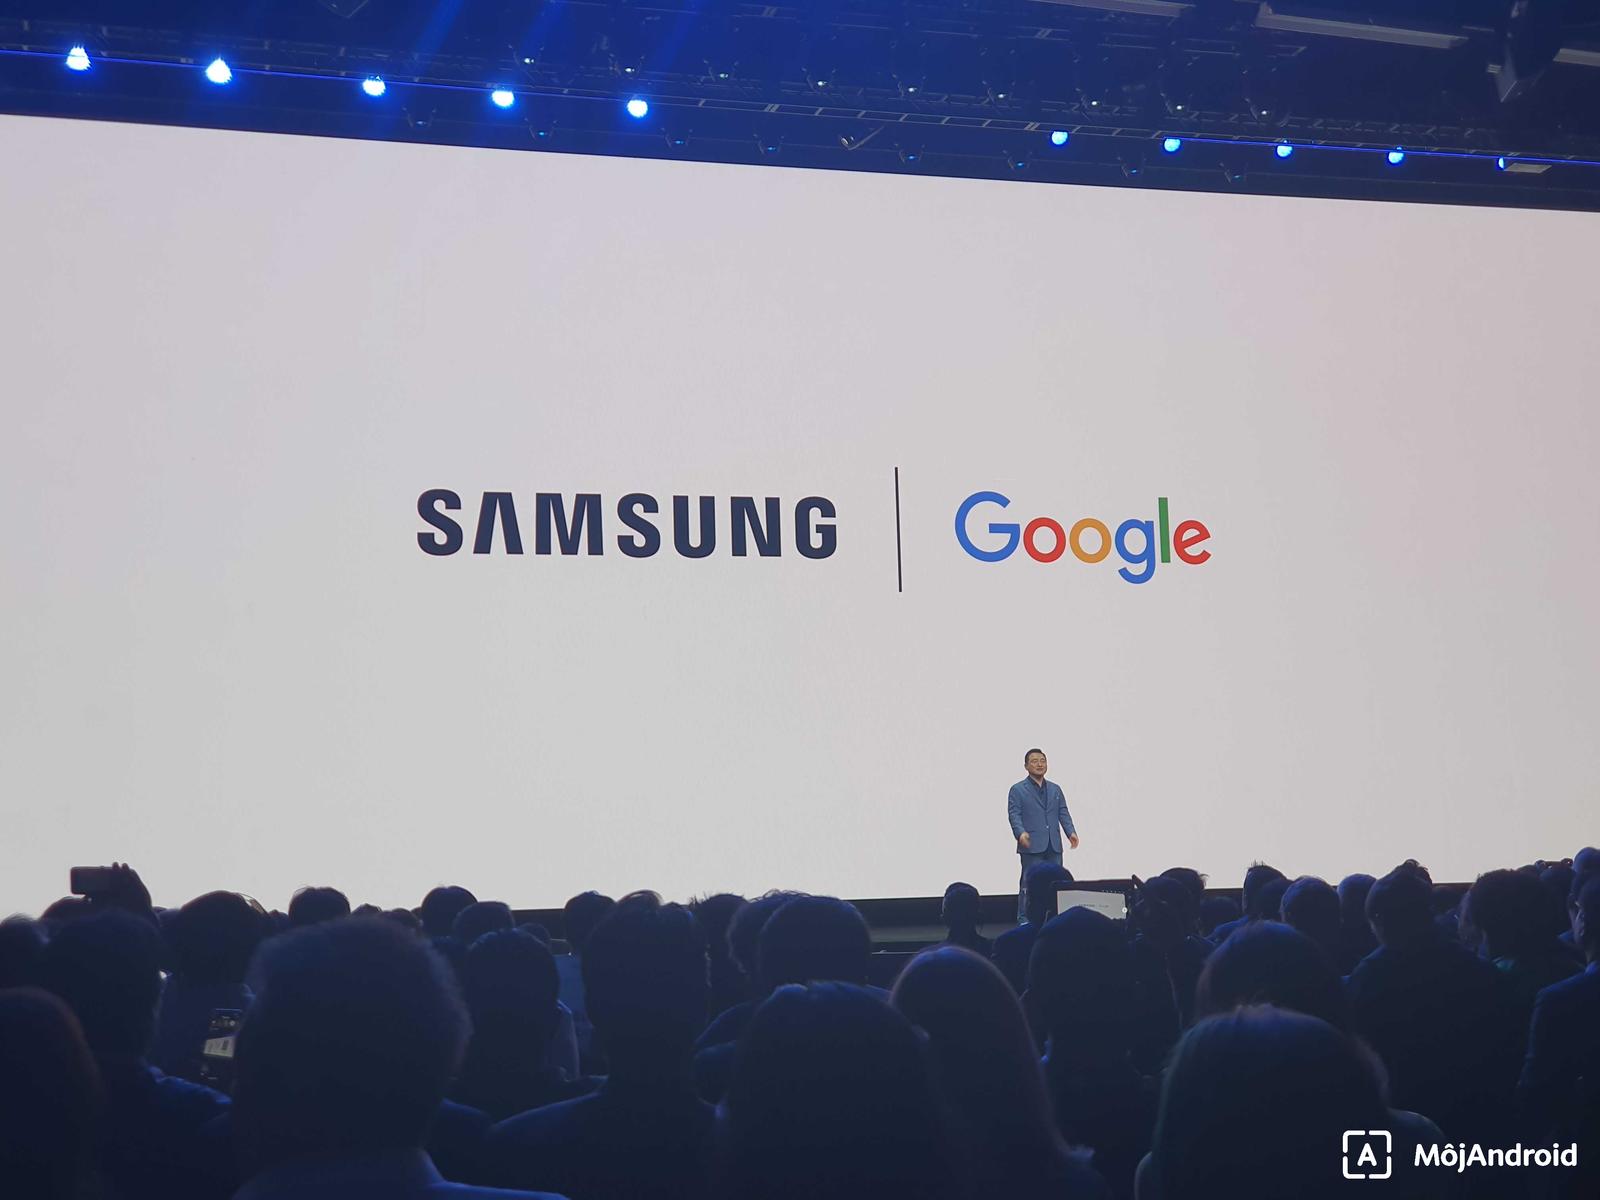 samsung + google